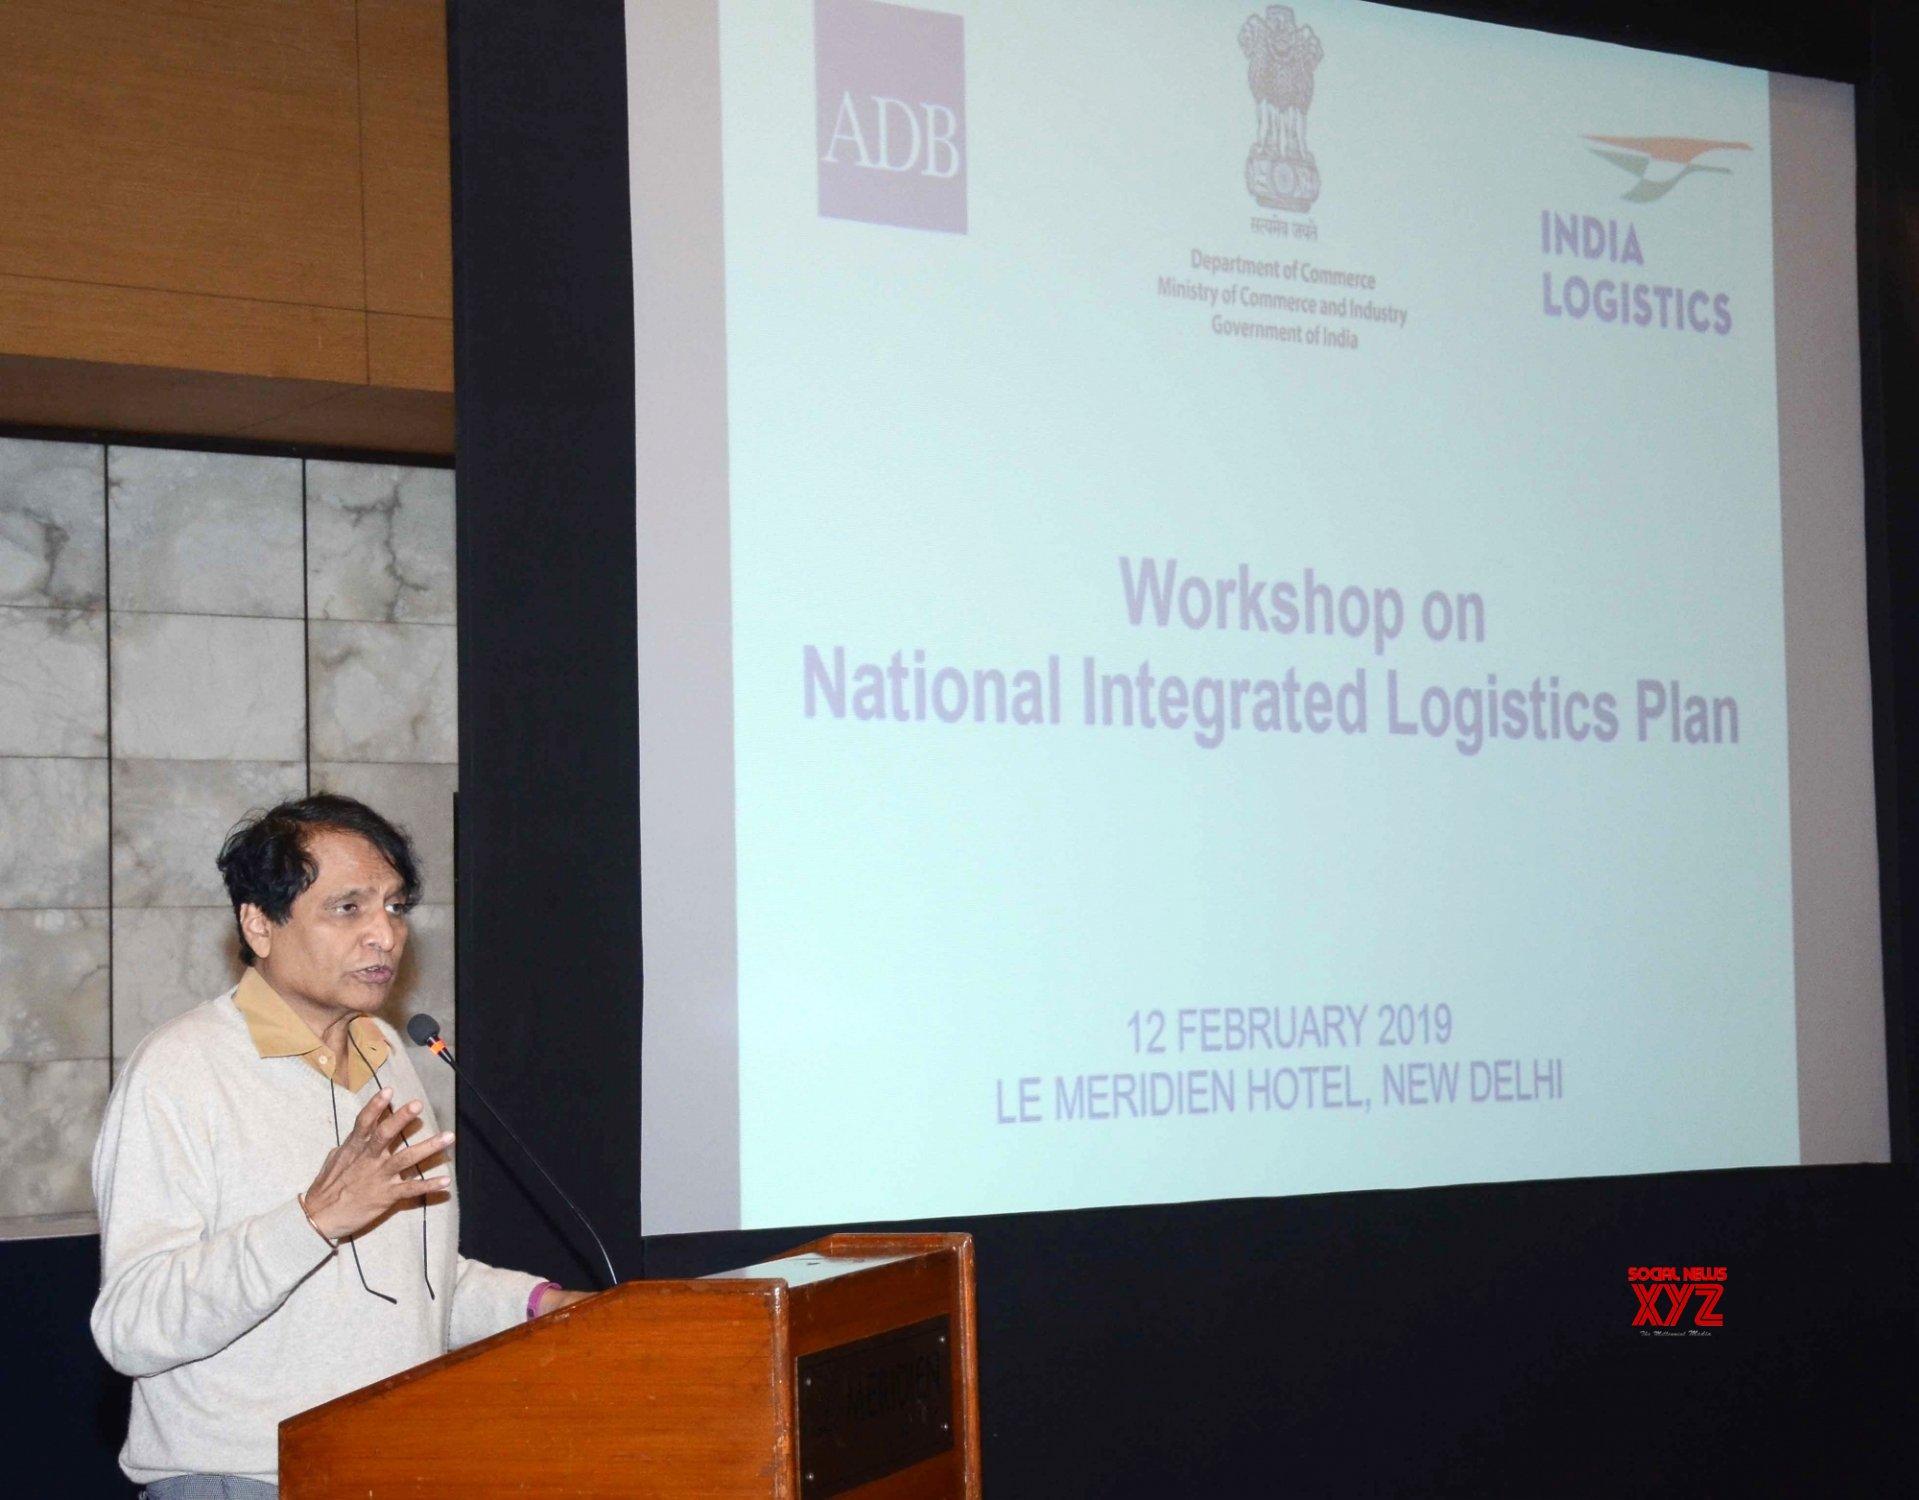 New Delhi: Suresh Prabhu at workshop on National Integrated Logistics Plan #Gallery